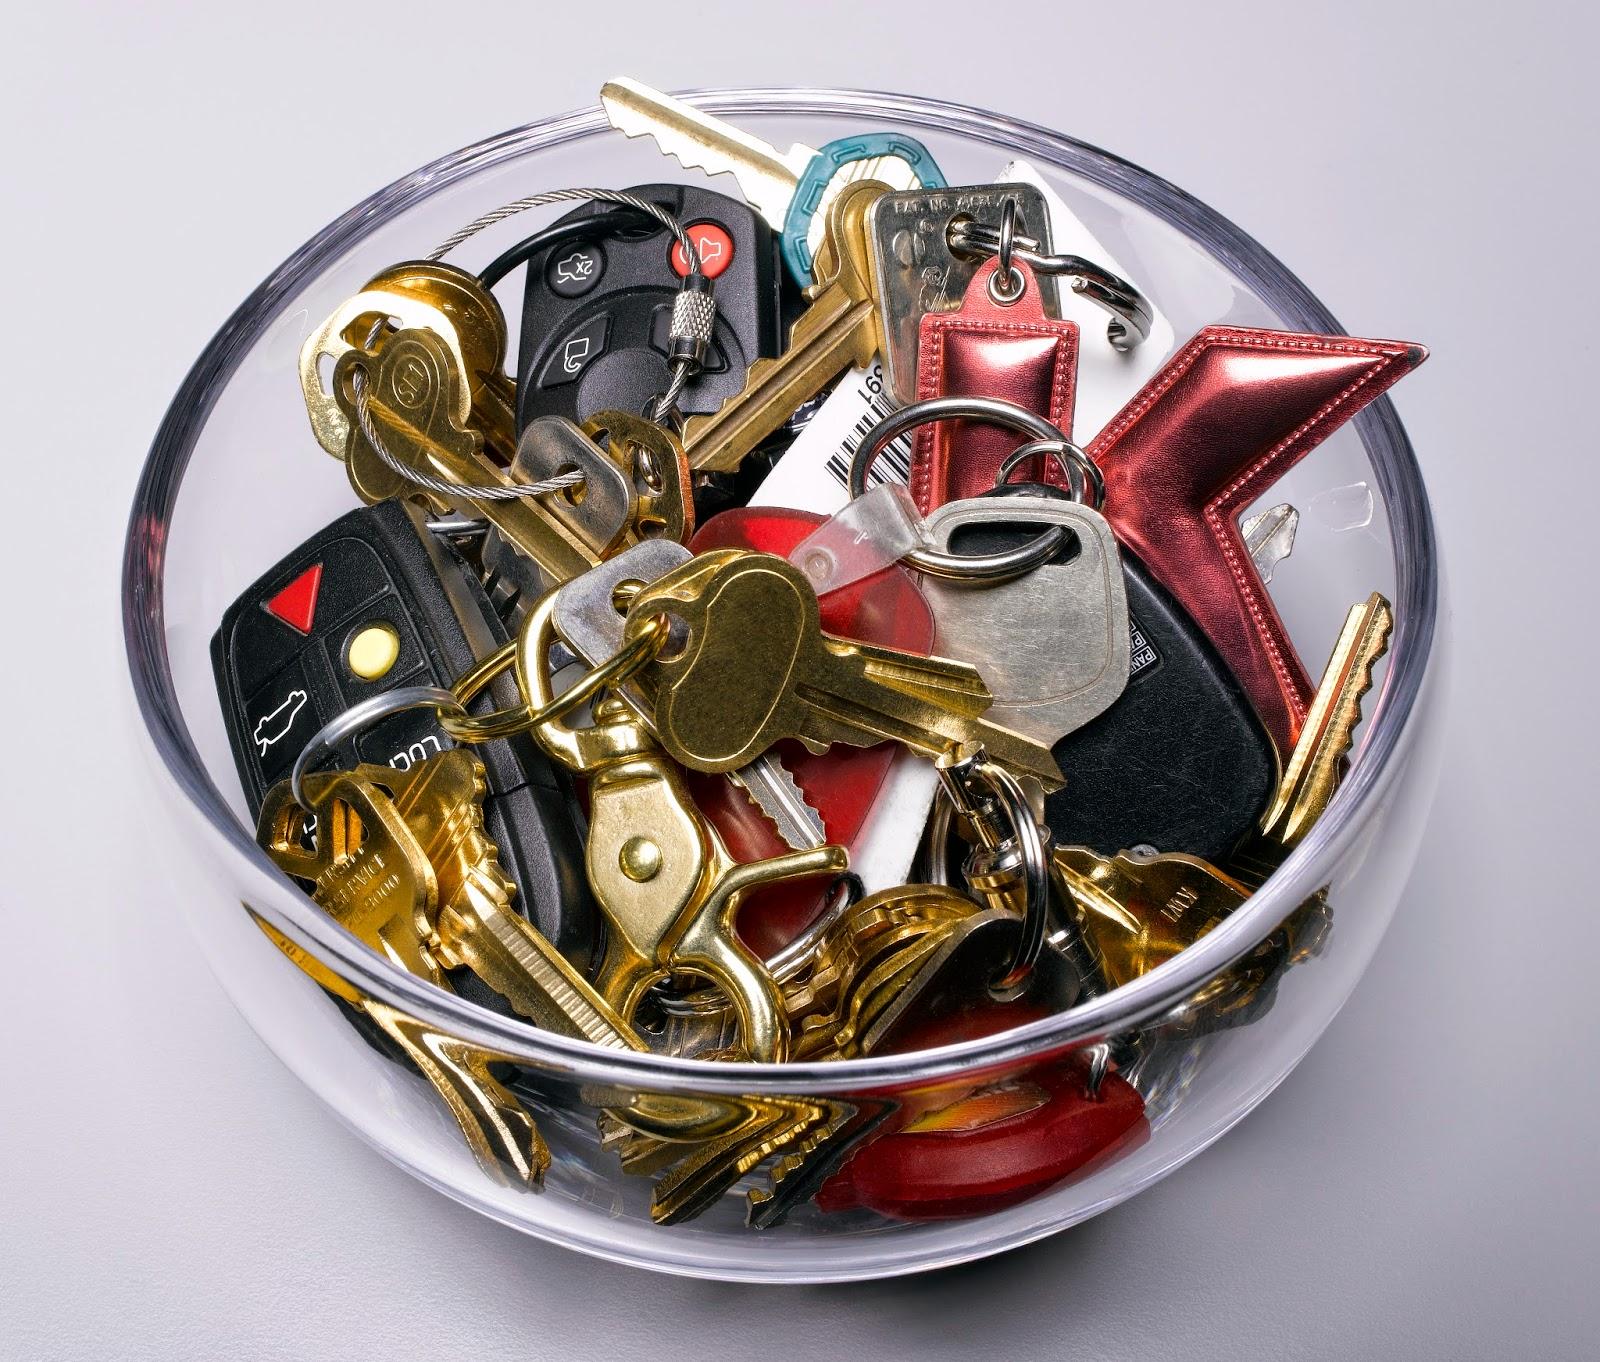 Bowl of keys